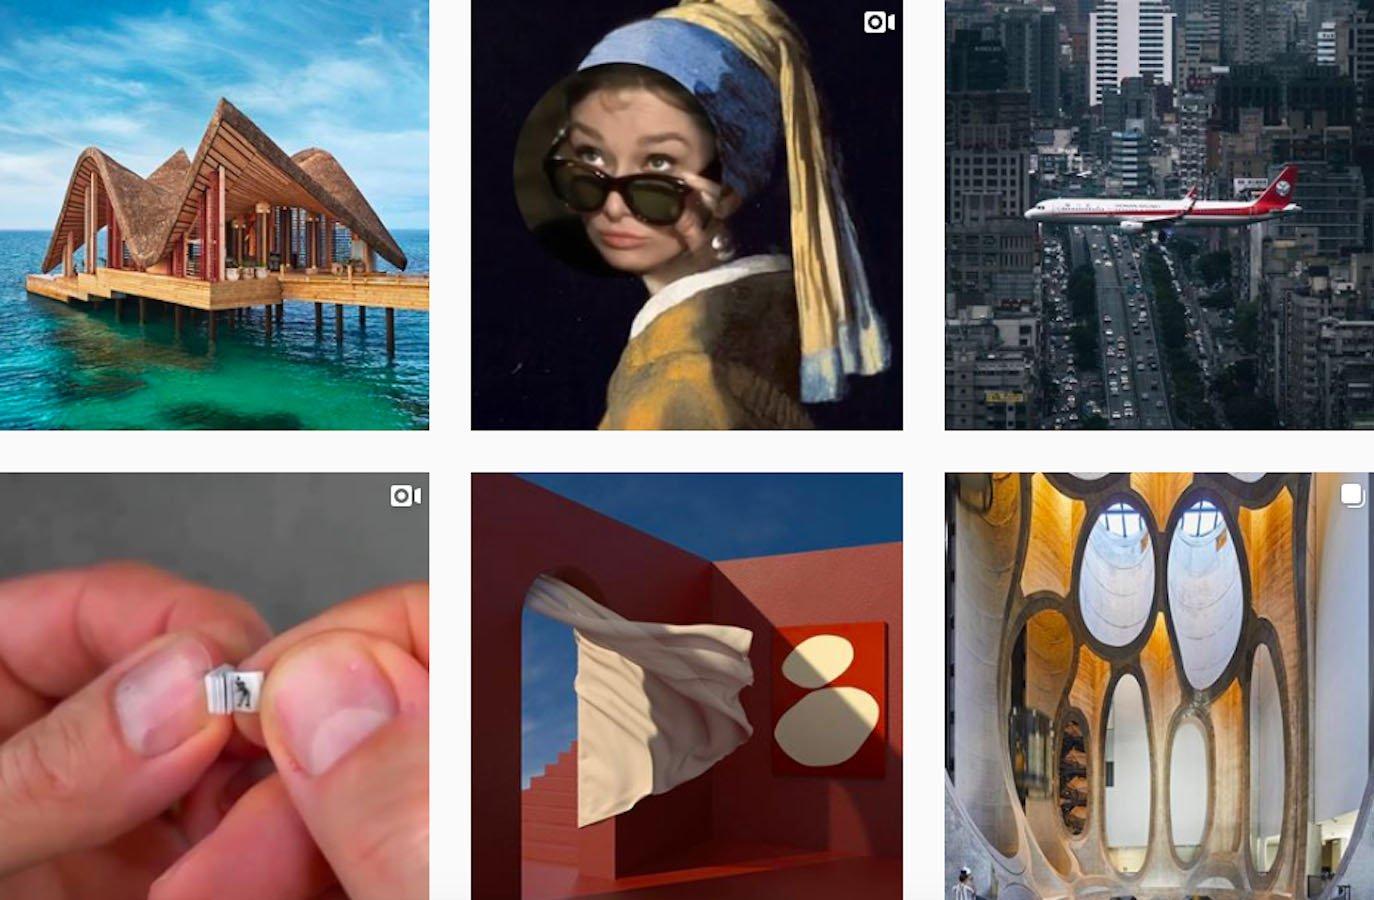 Web Design Inspiration: 110+ Accounts On Instagram and 10+ Best UX & Web Design Books in 2020 - designboom